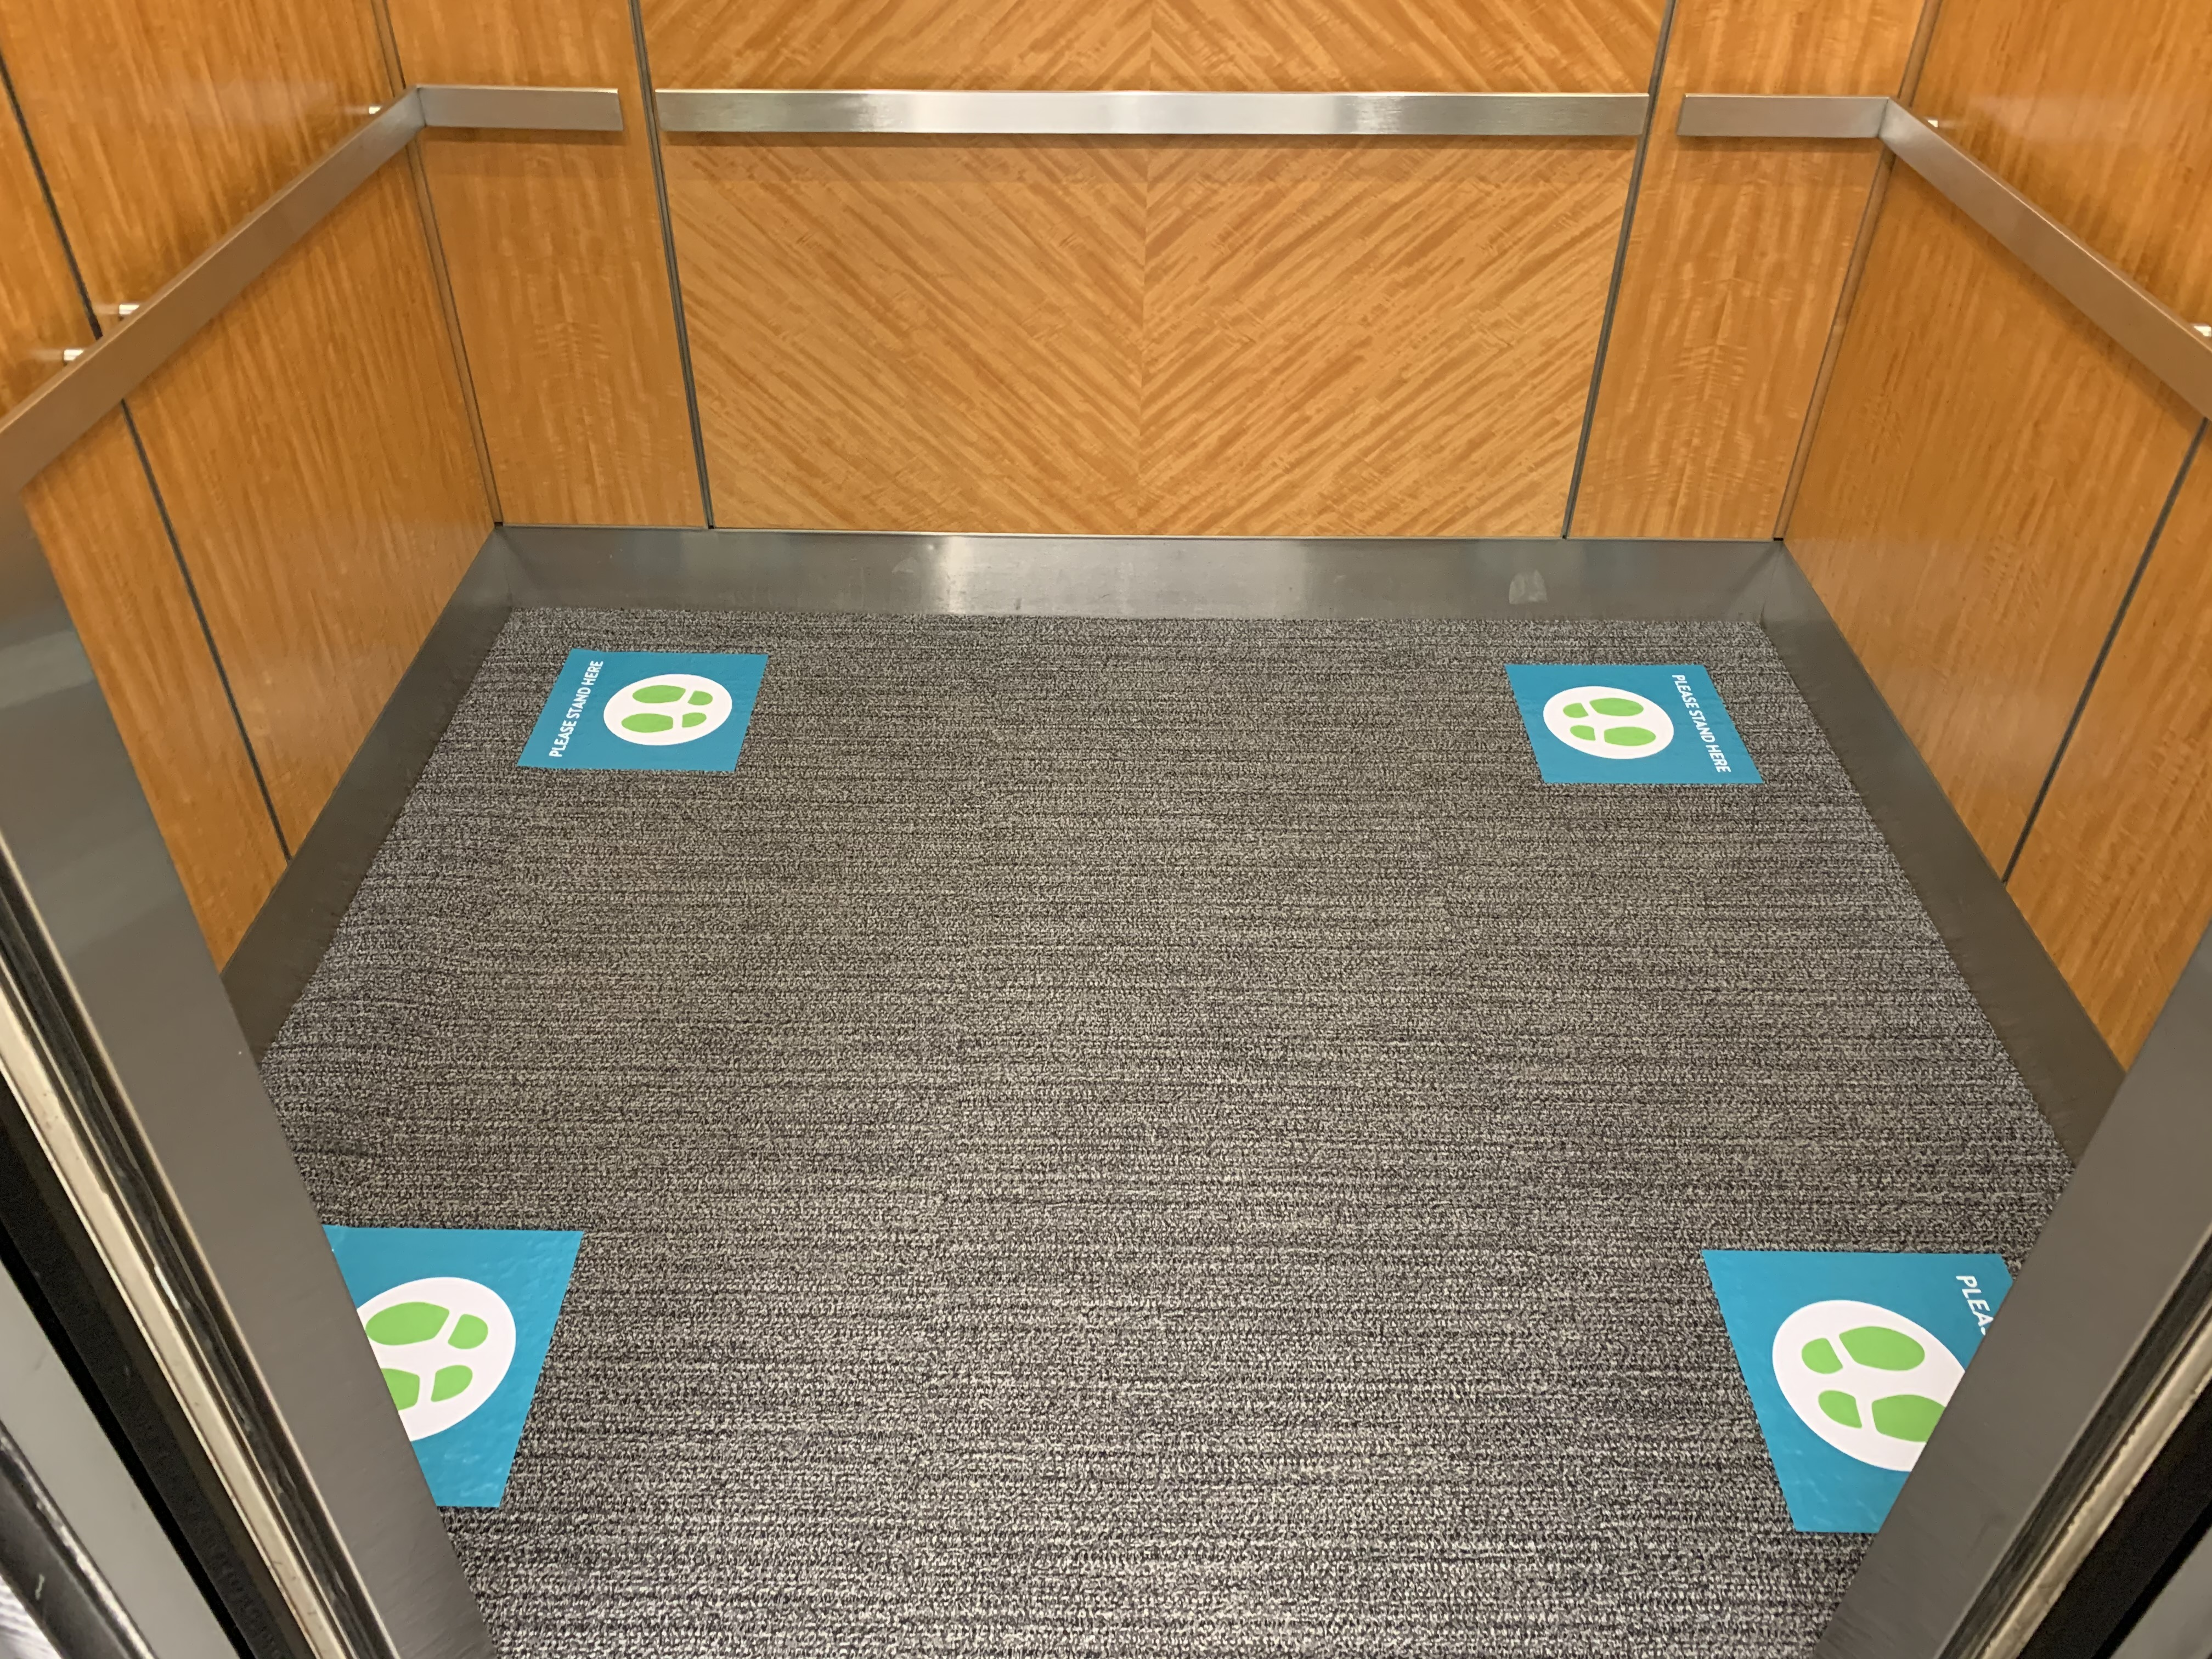 Elevator Social Distancing Sign